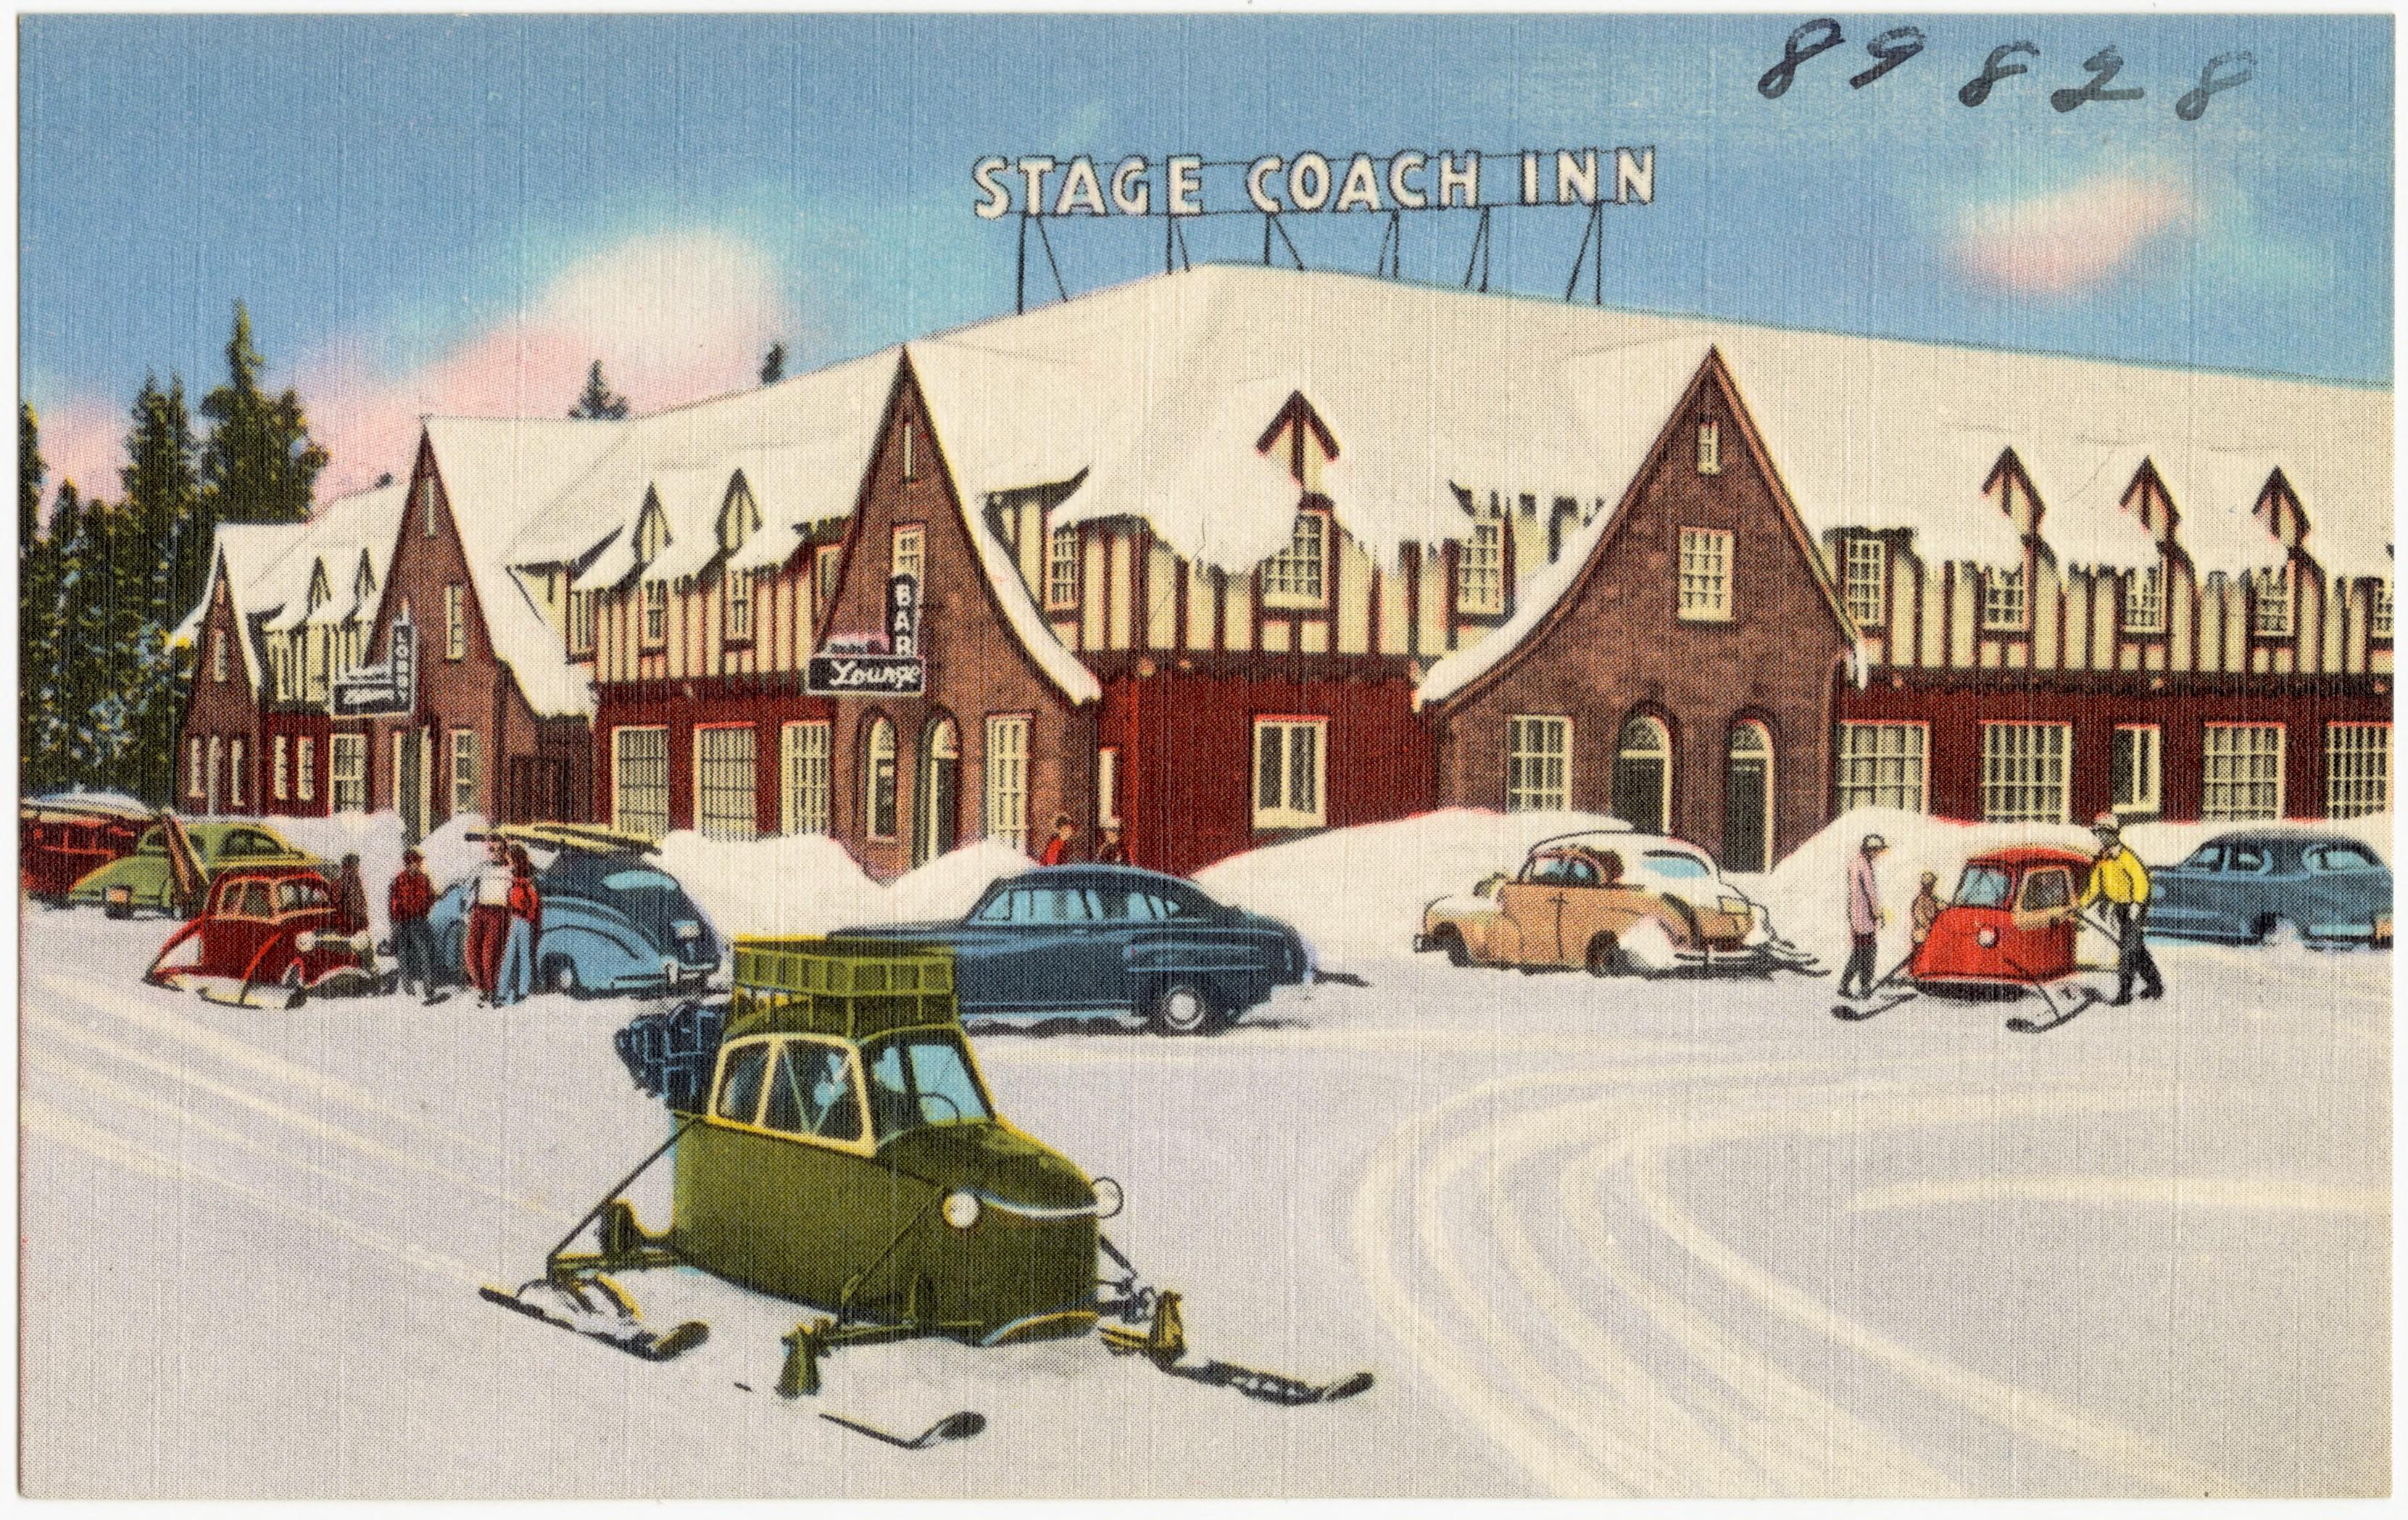 FileStage Coach Inn West Yellowstone Montana 89828